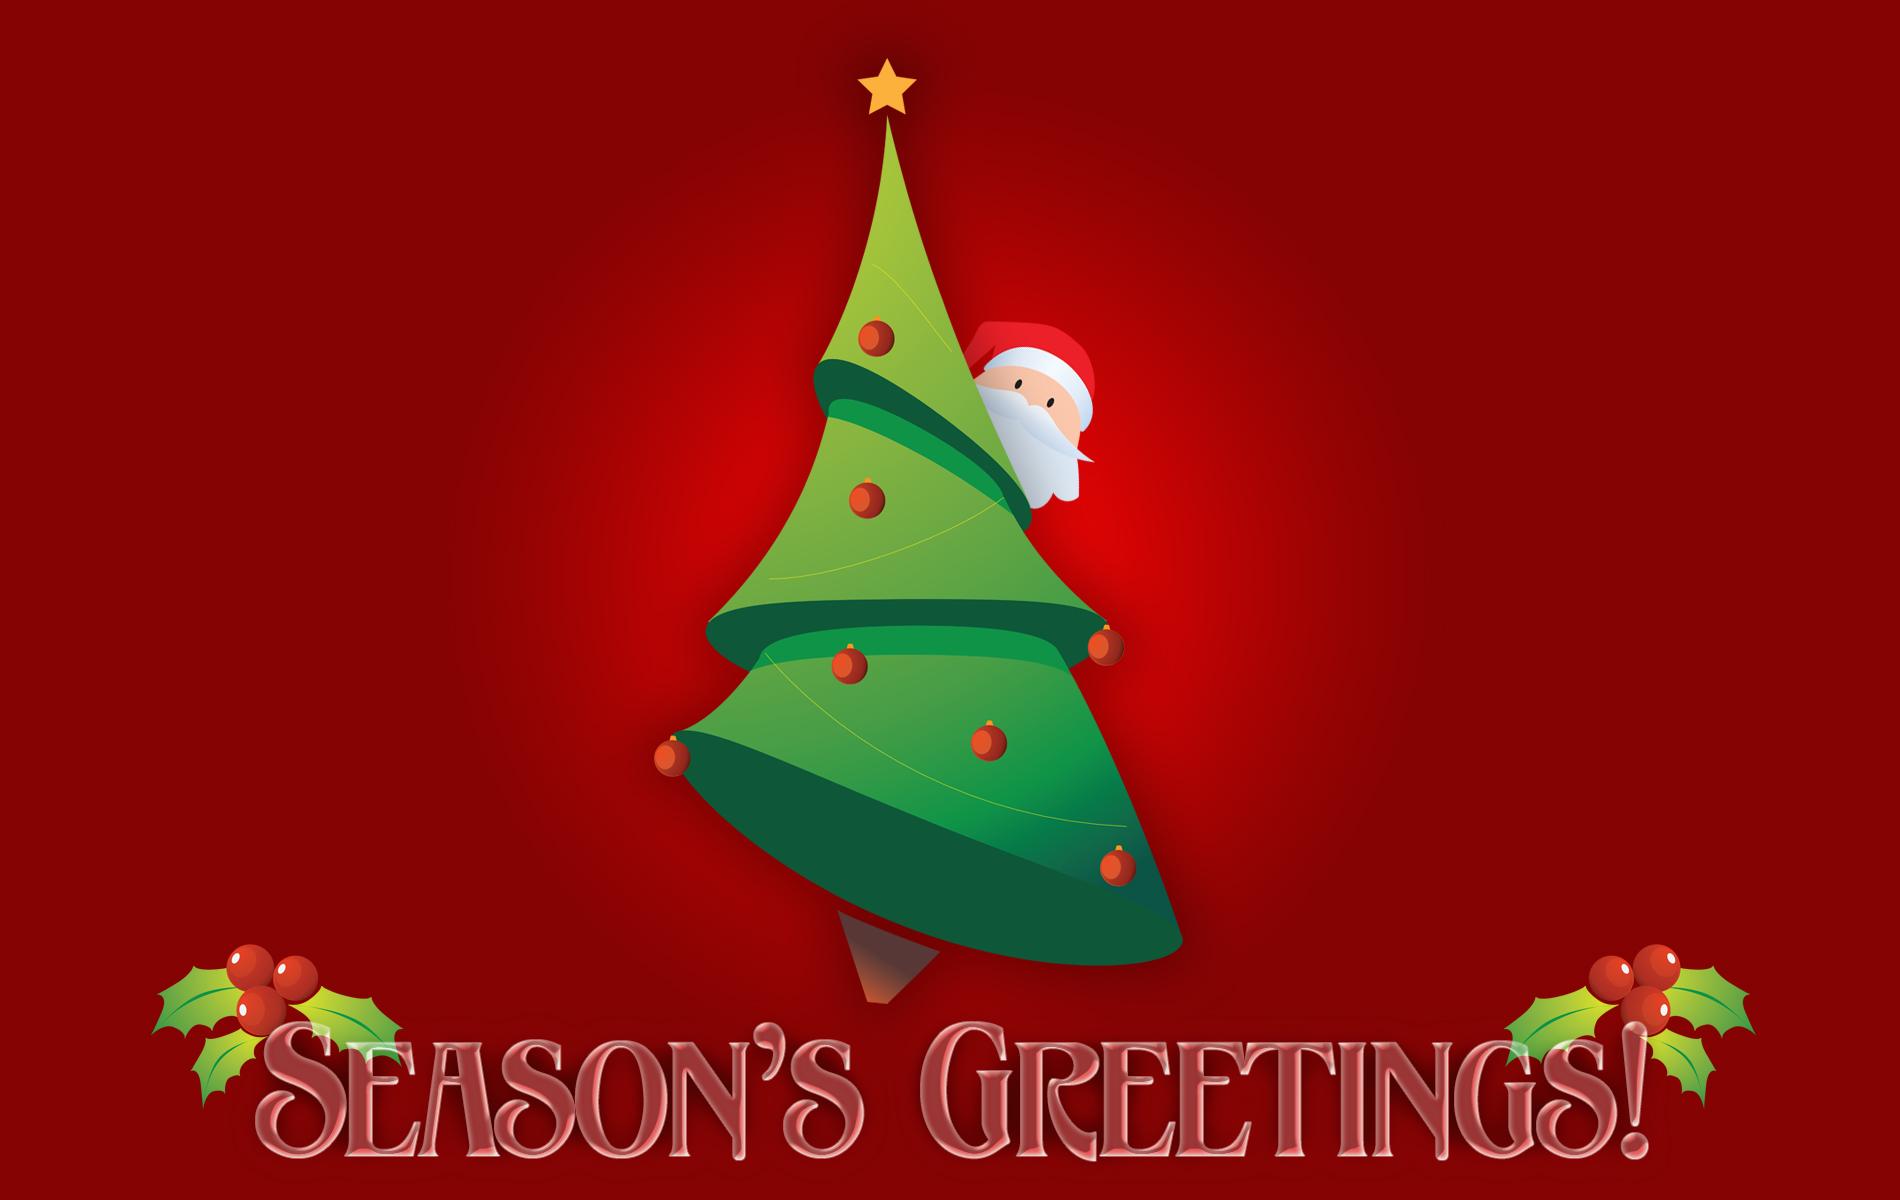 Christmas wallpaper x-mas